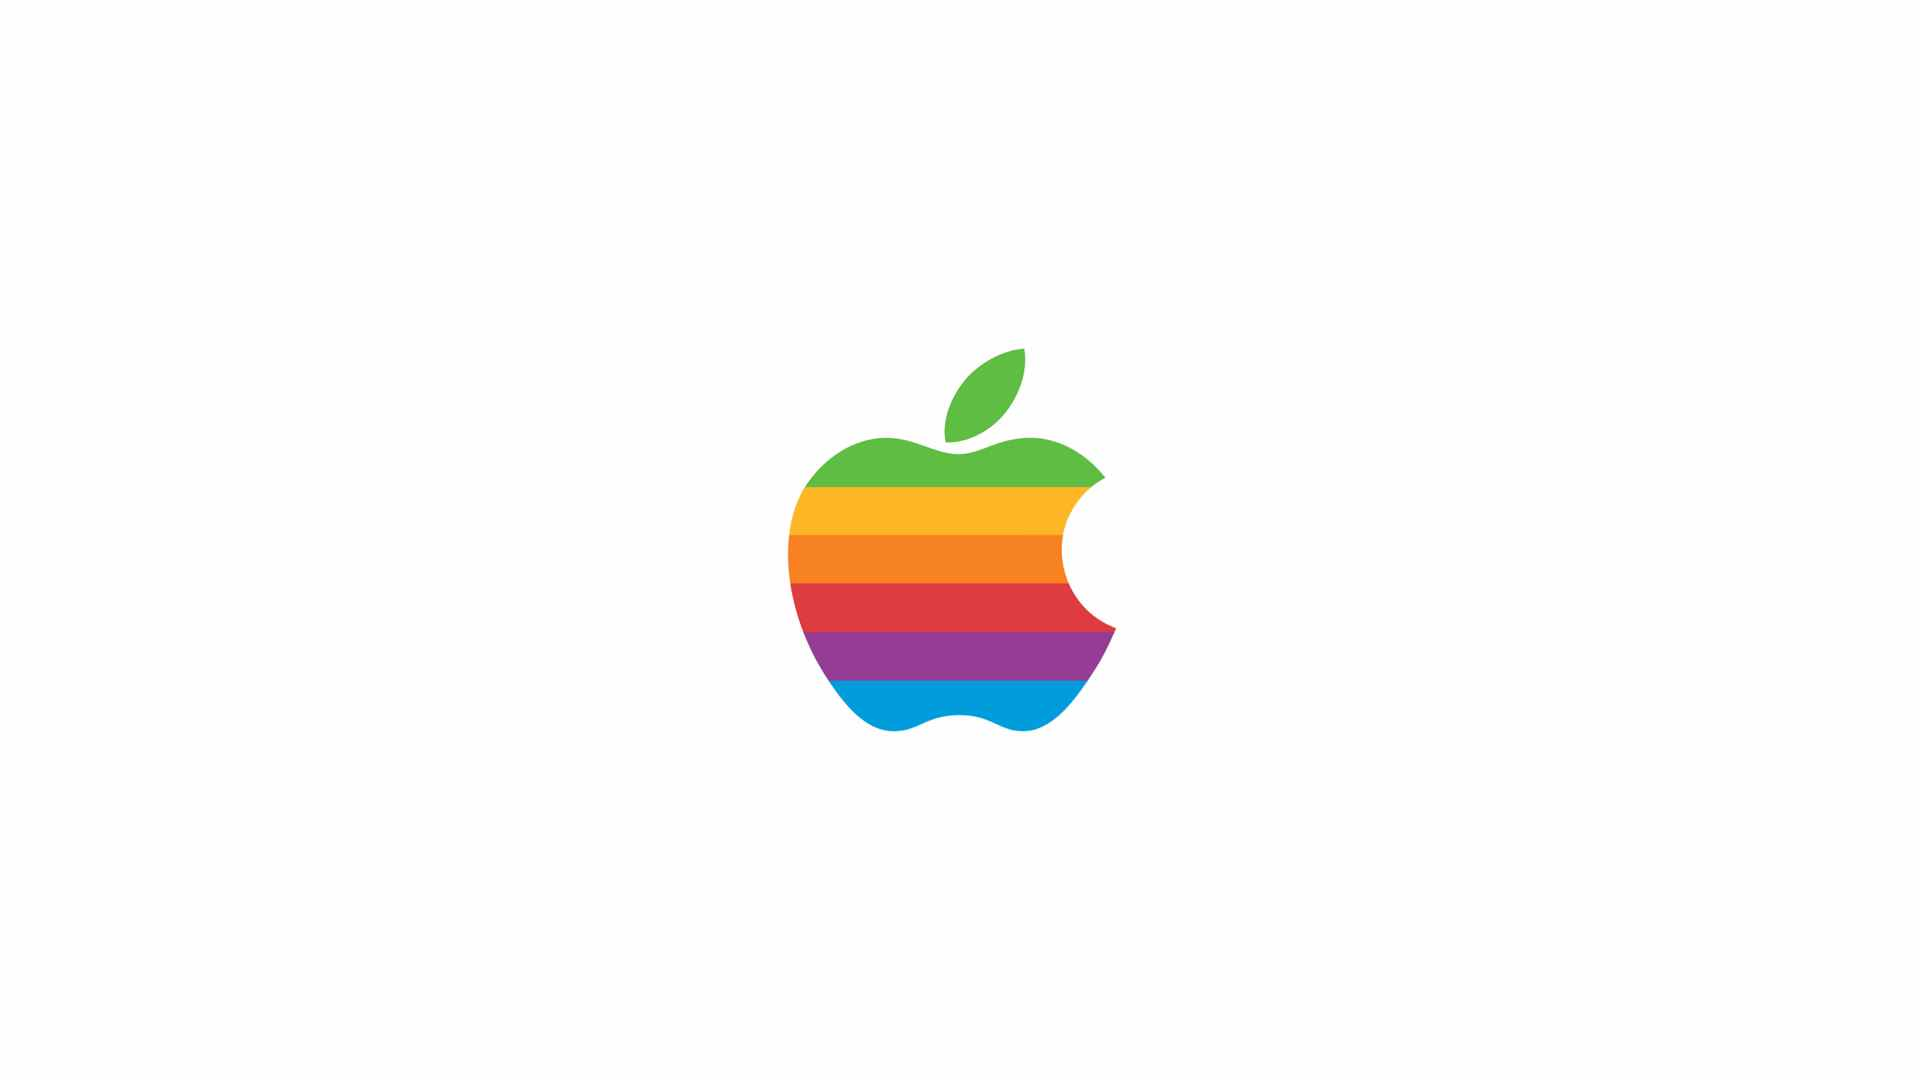 Desktop Mac 5K Fondo de pantalla